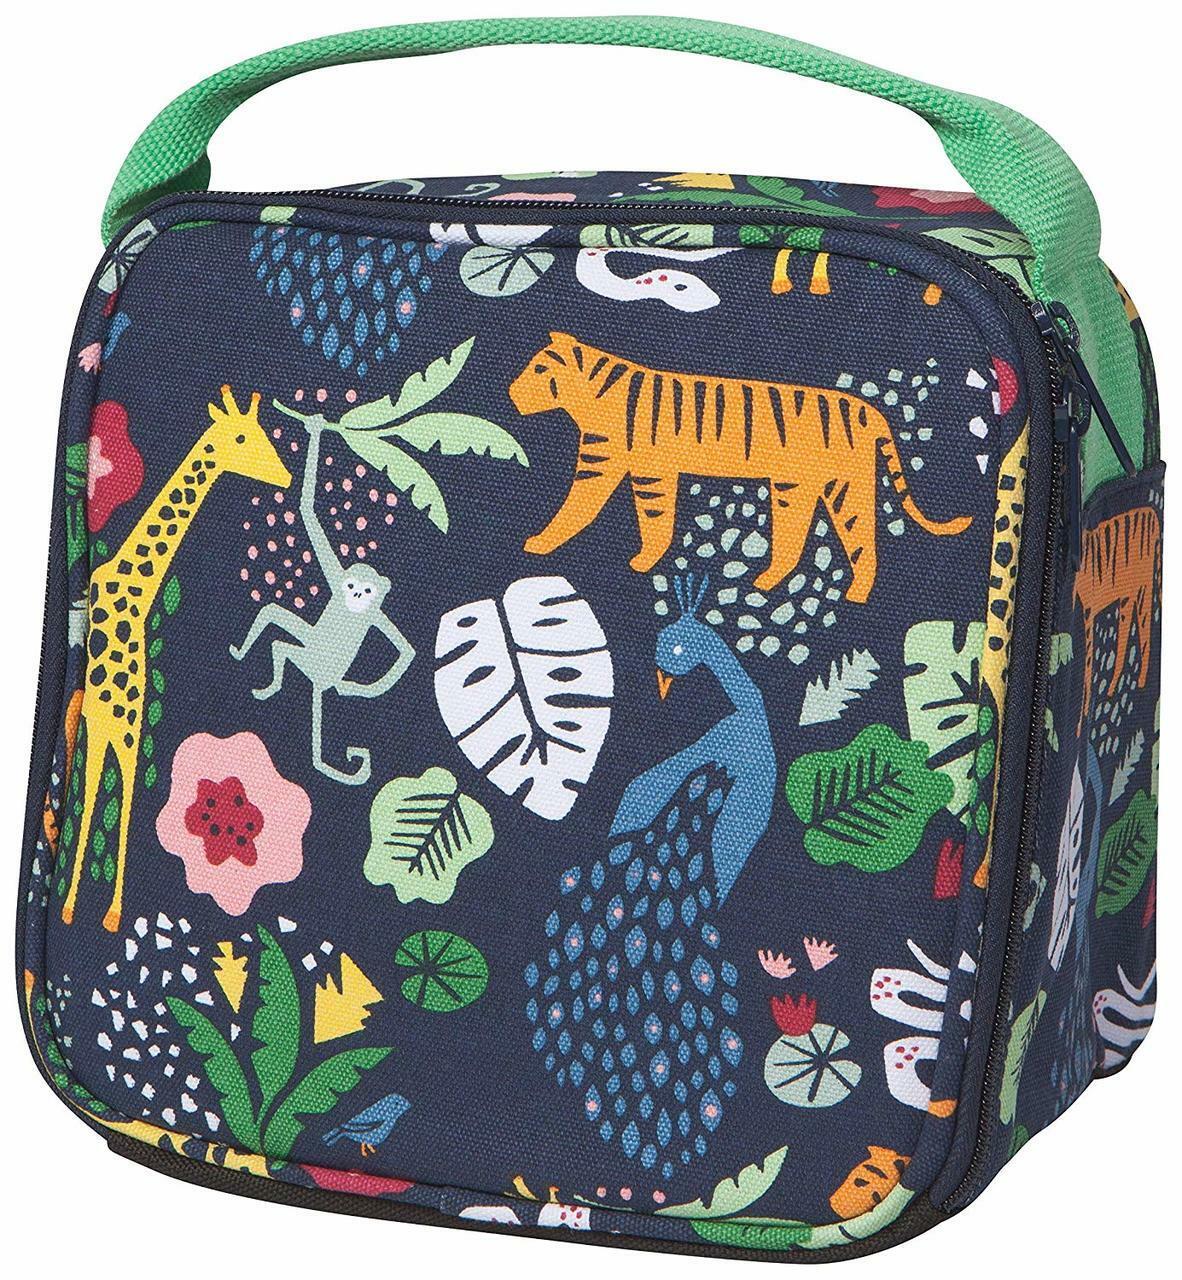 Wild Bunch Animals Lunch Bag (exterior view)